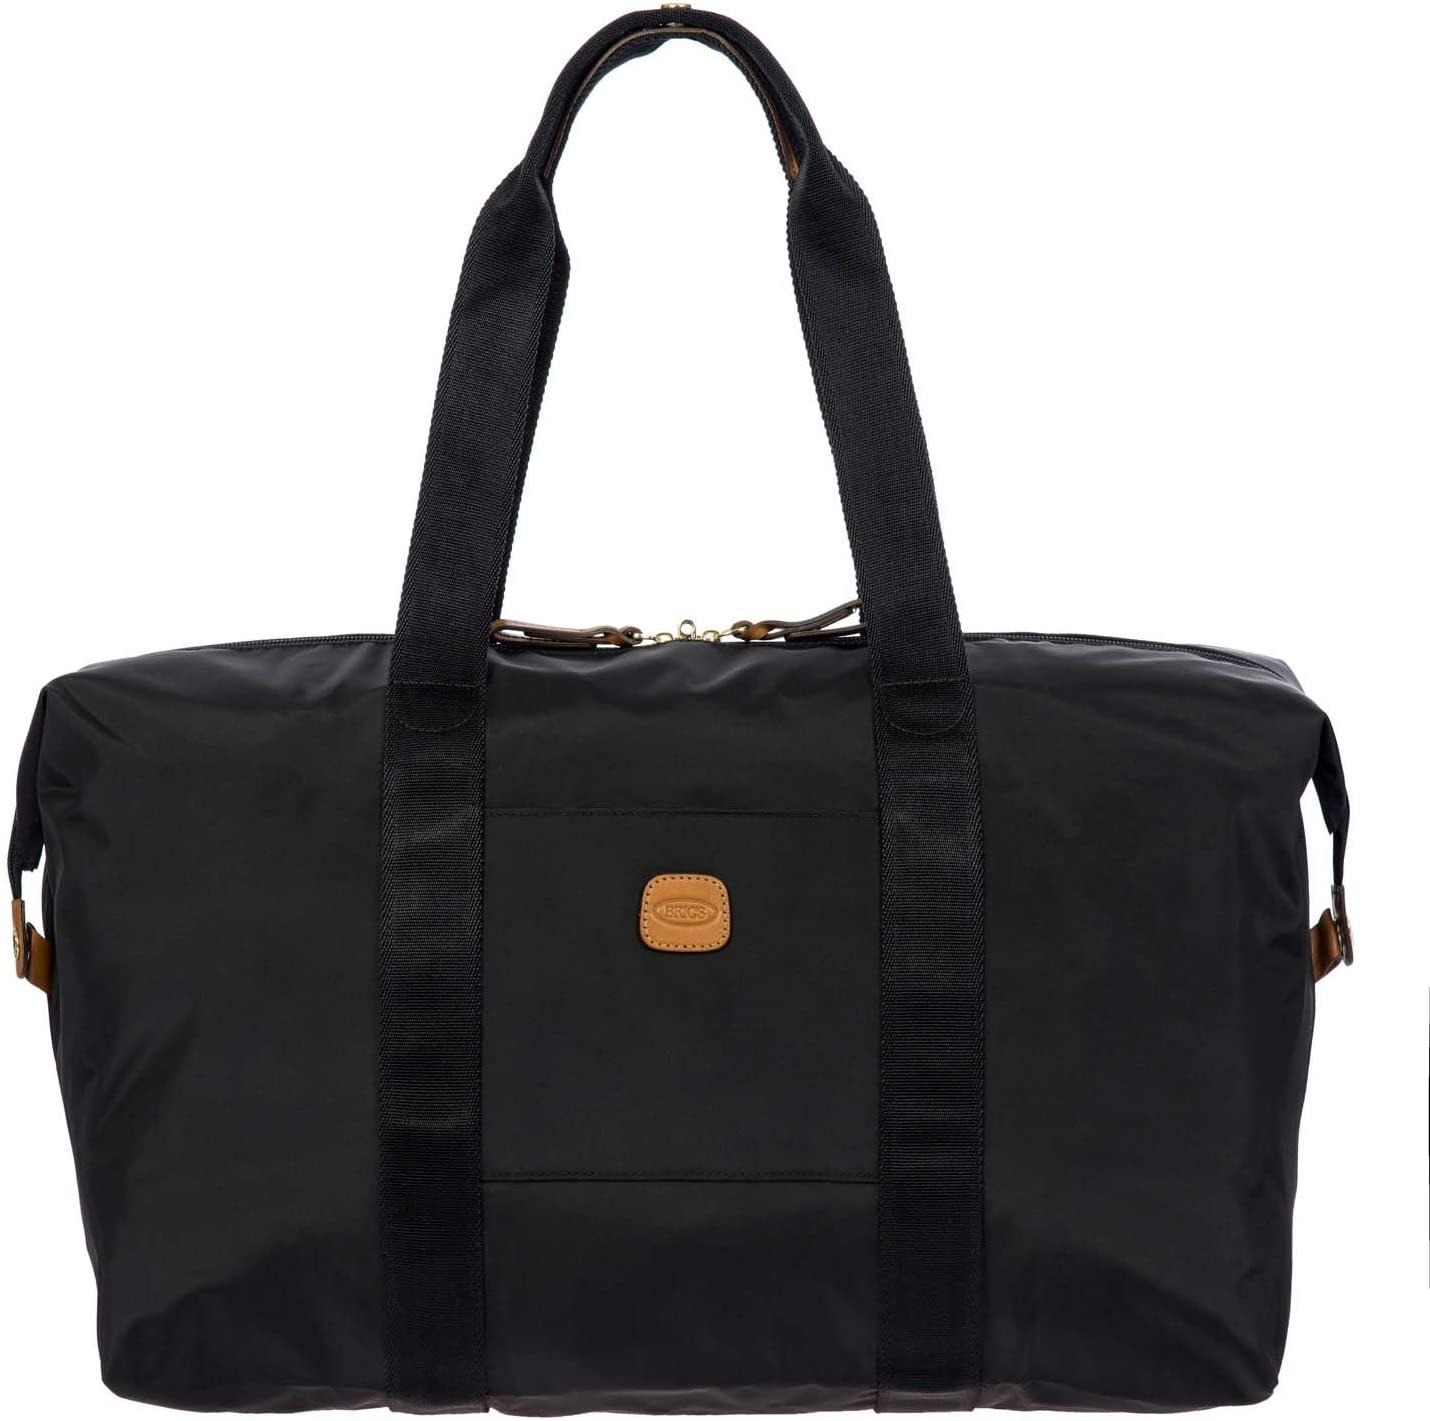 Bric's USA Luggage Model: X-BAG/X-TRAVEL  Size: 18